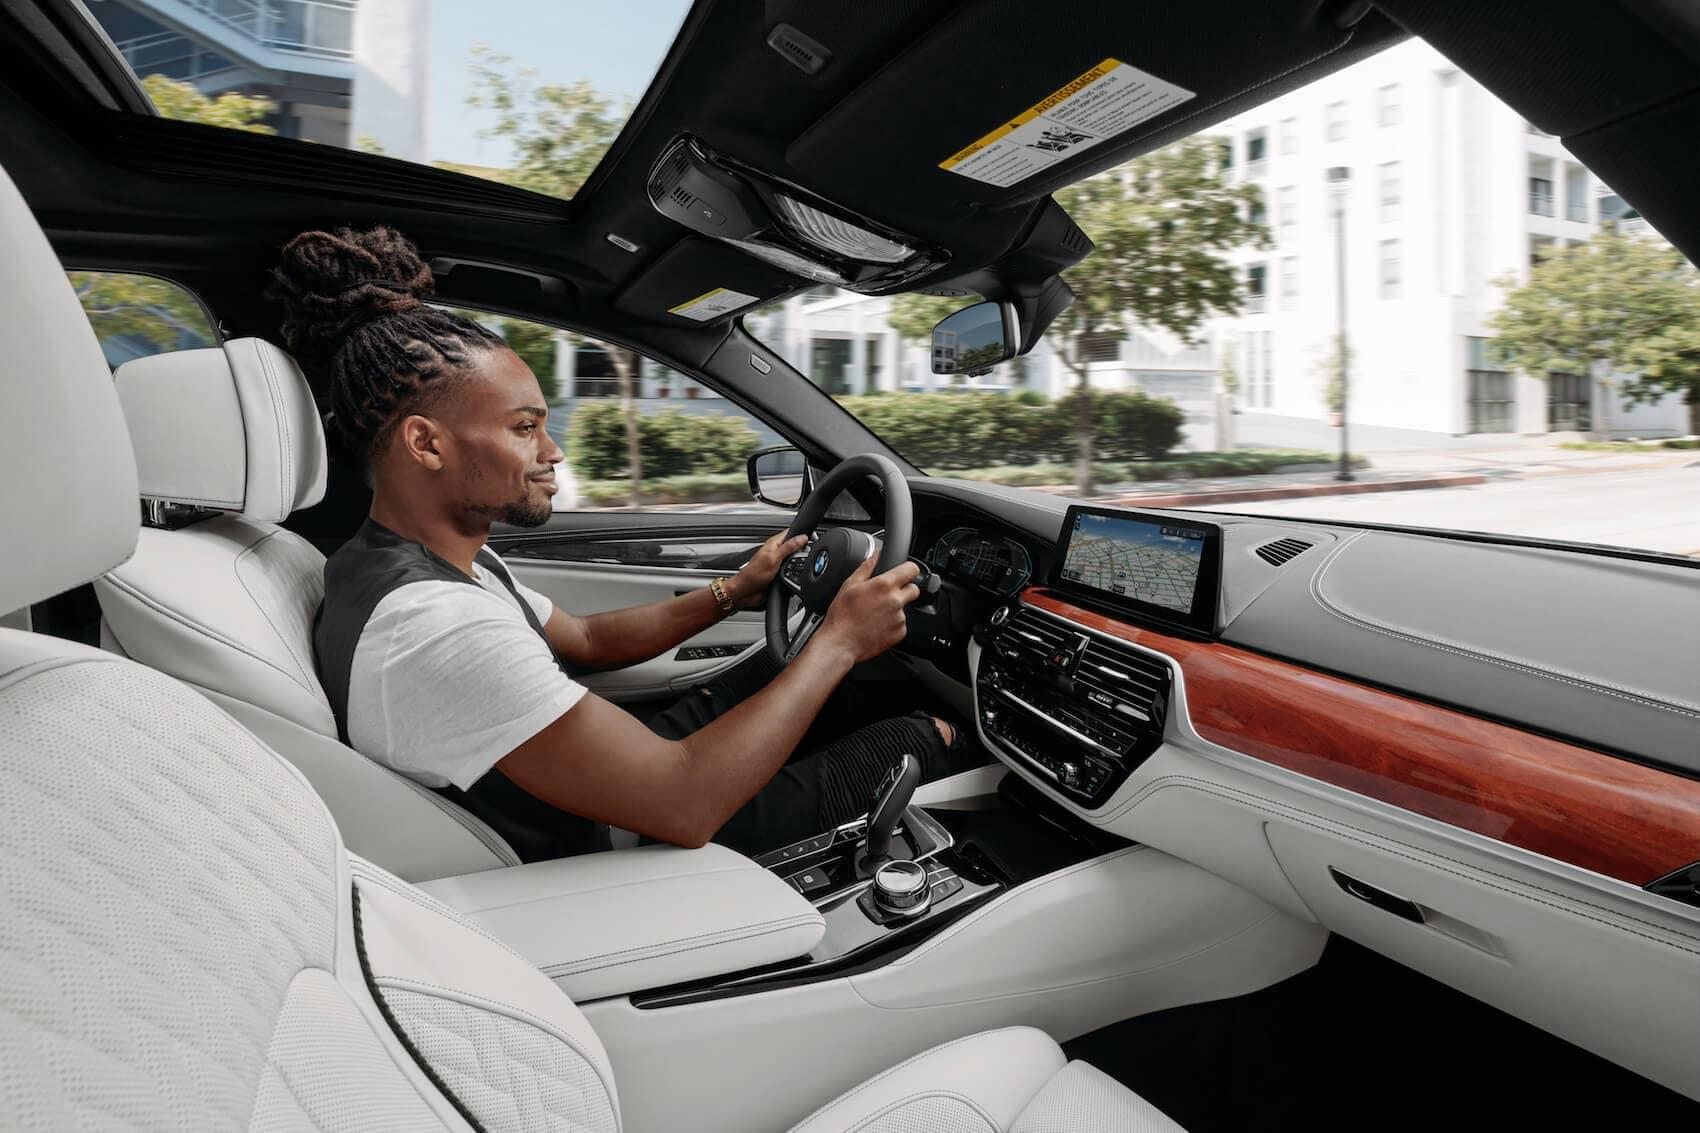 2020 BMW 5 series interior Tampa, FL